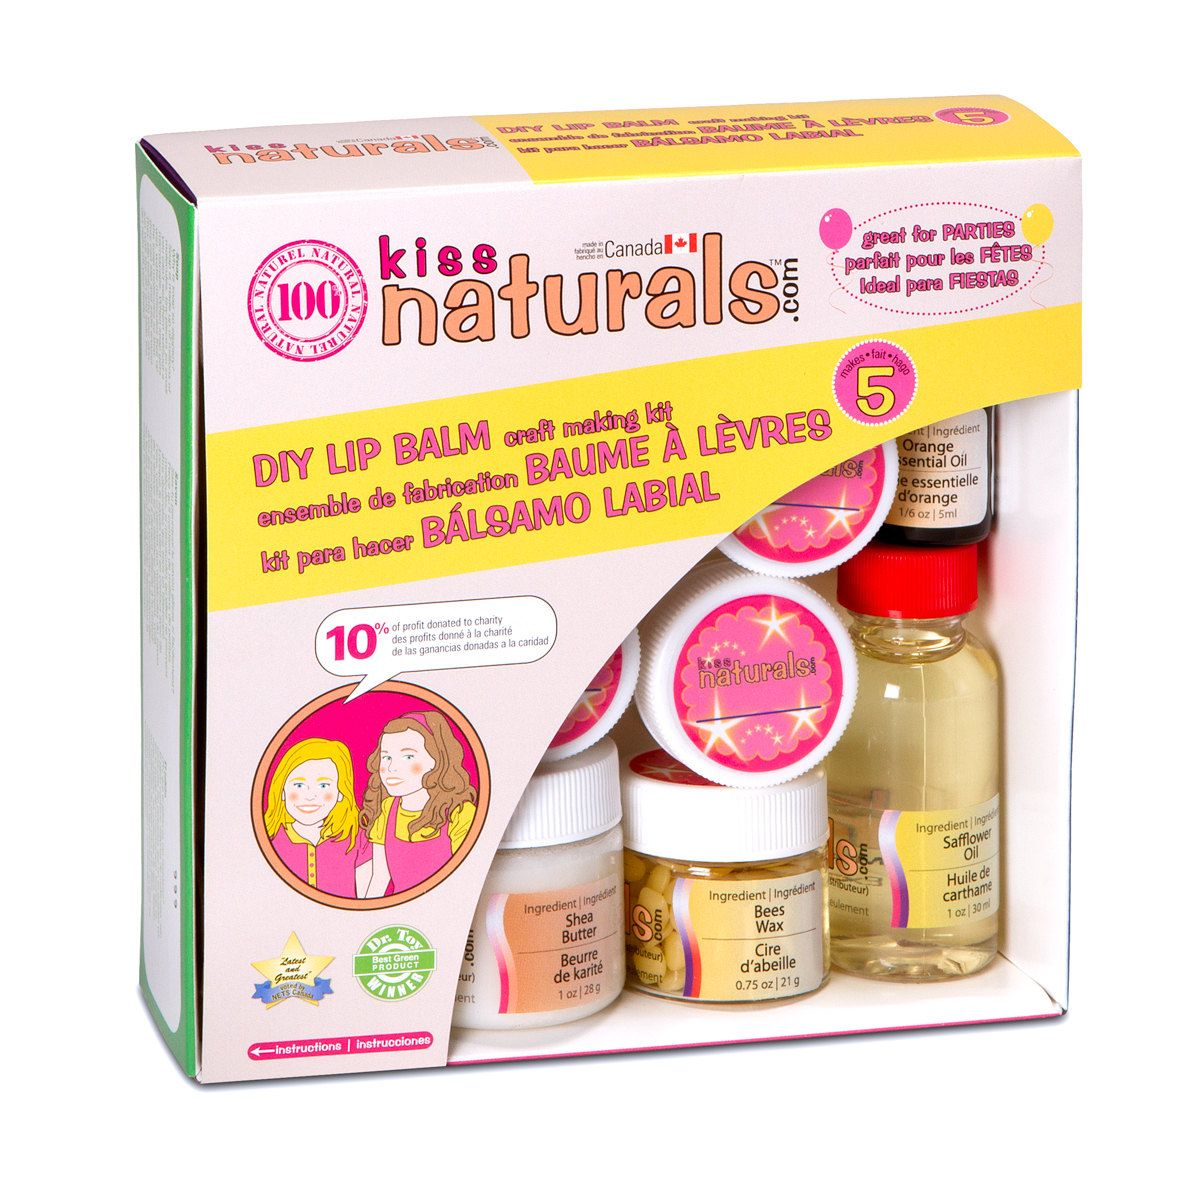 Kiss Naturals All Natural Lip Balm Making Kit Mini. 12